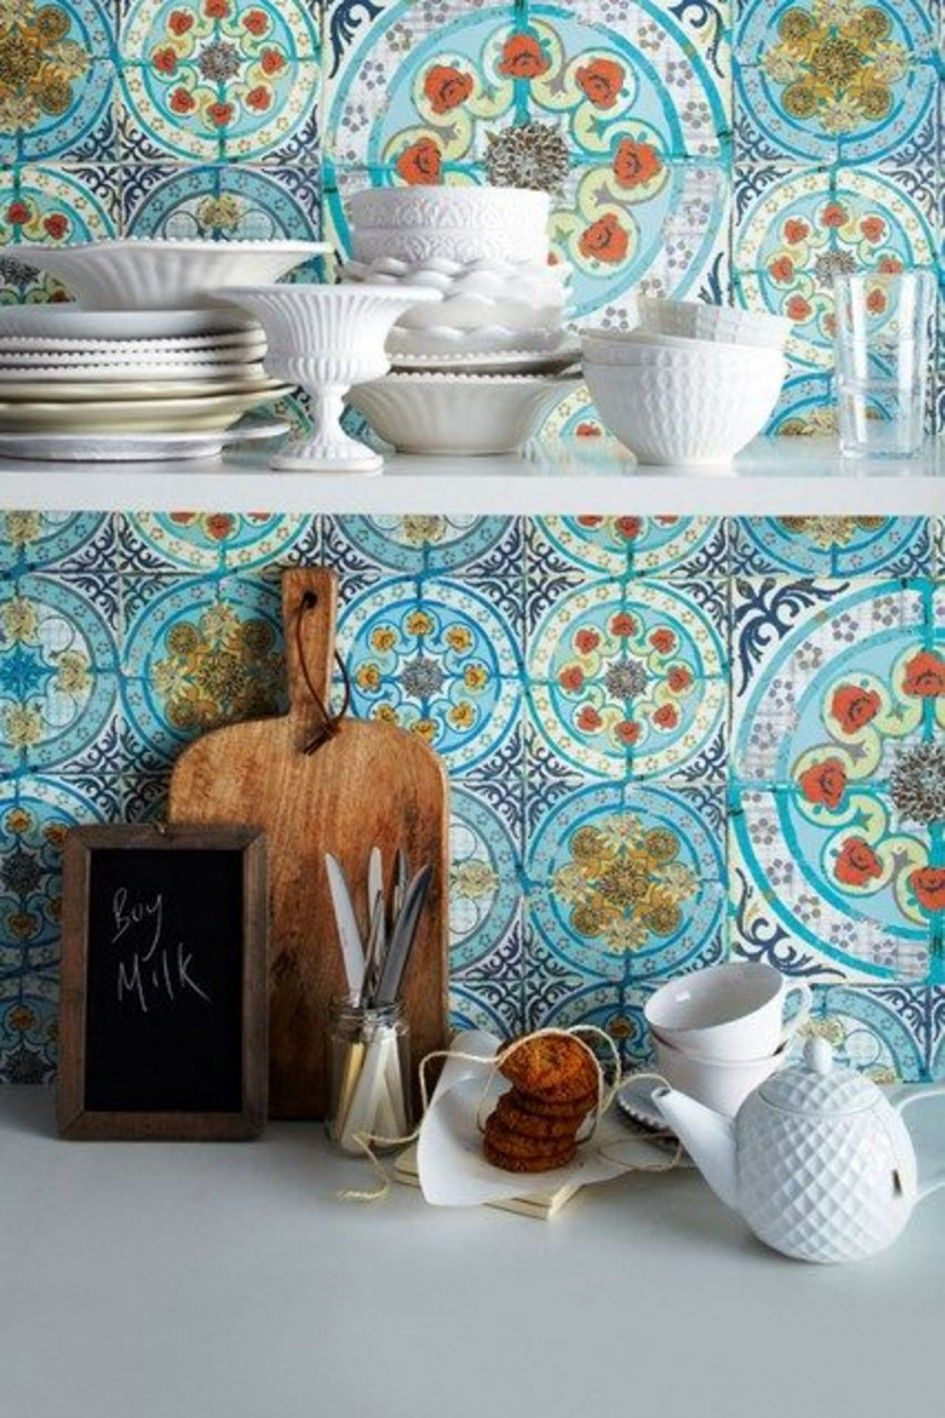 Kitchen blue pattern moroccan backsplash tile ceramic material kitchen blue pattern moroccan backsplash tile ceramic material white laminated countertop wooden cutting board glass utensil dailygadgetfo Gallery